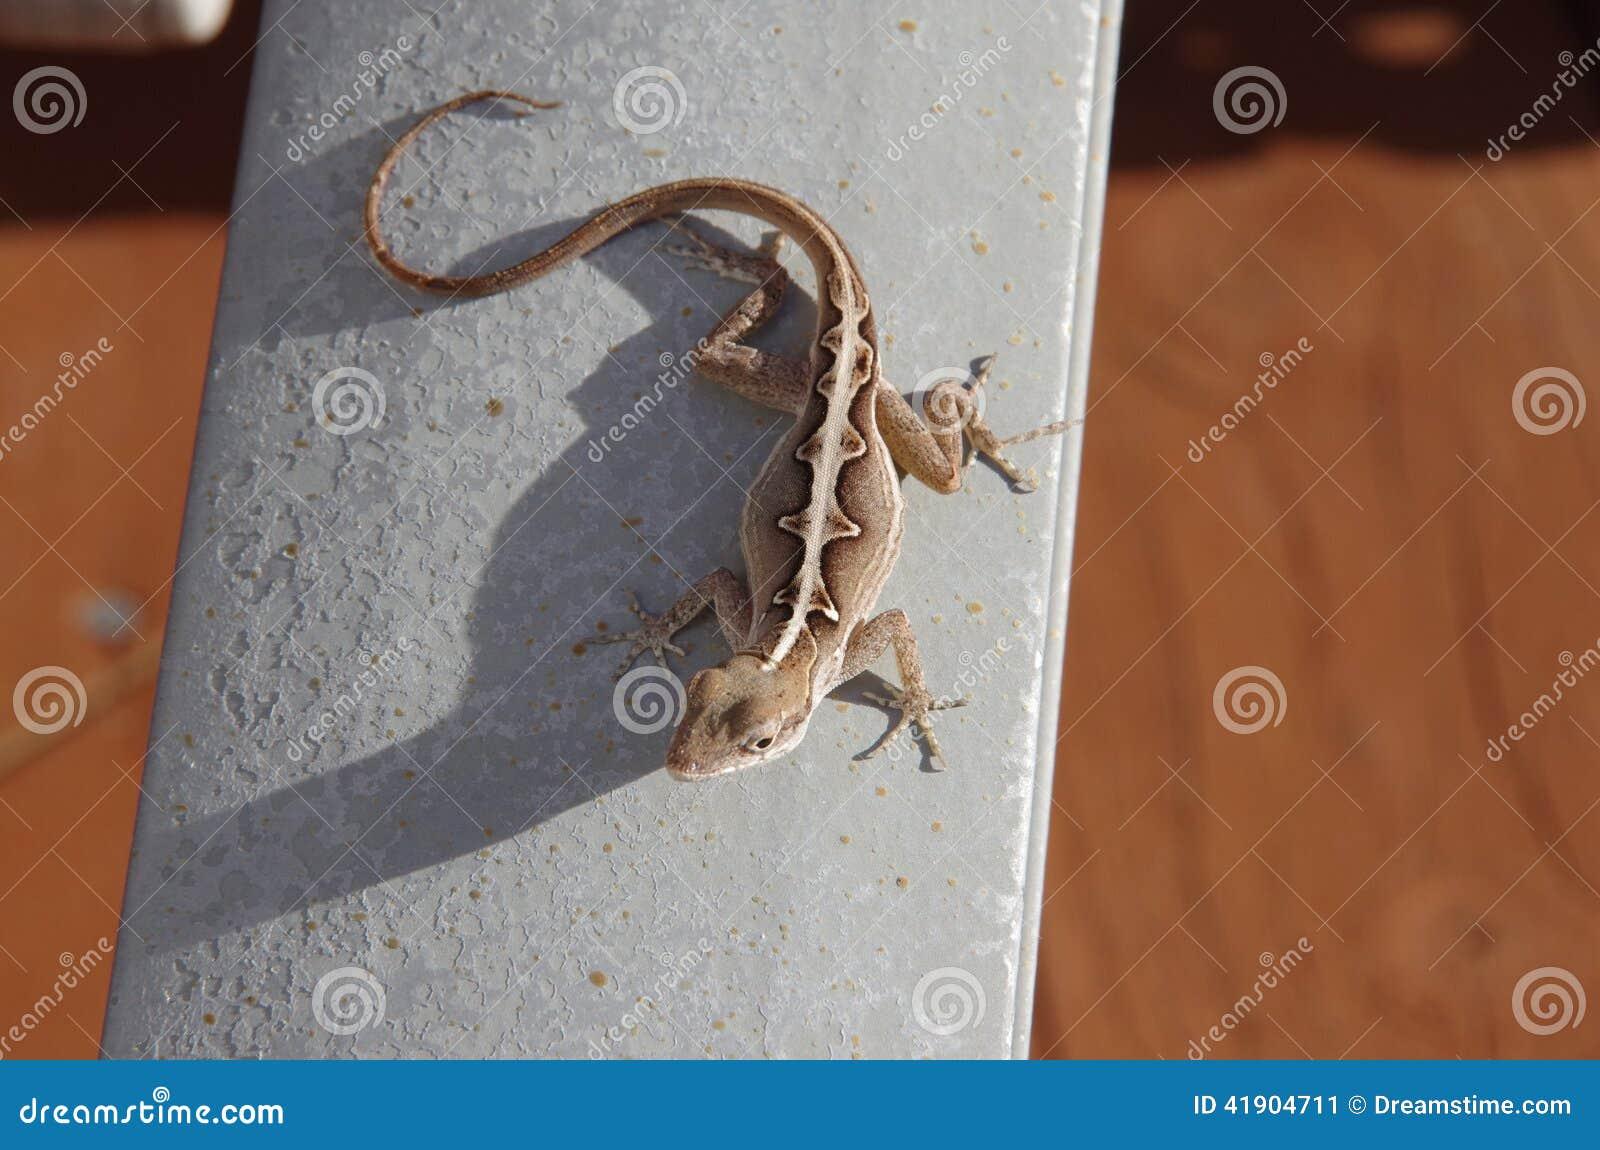 Anole, lagarto, salamandra